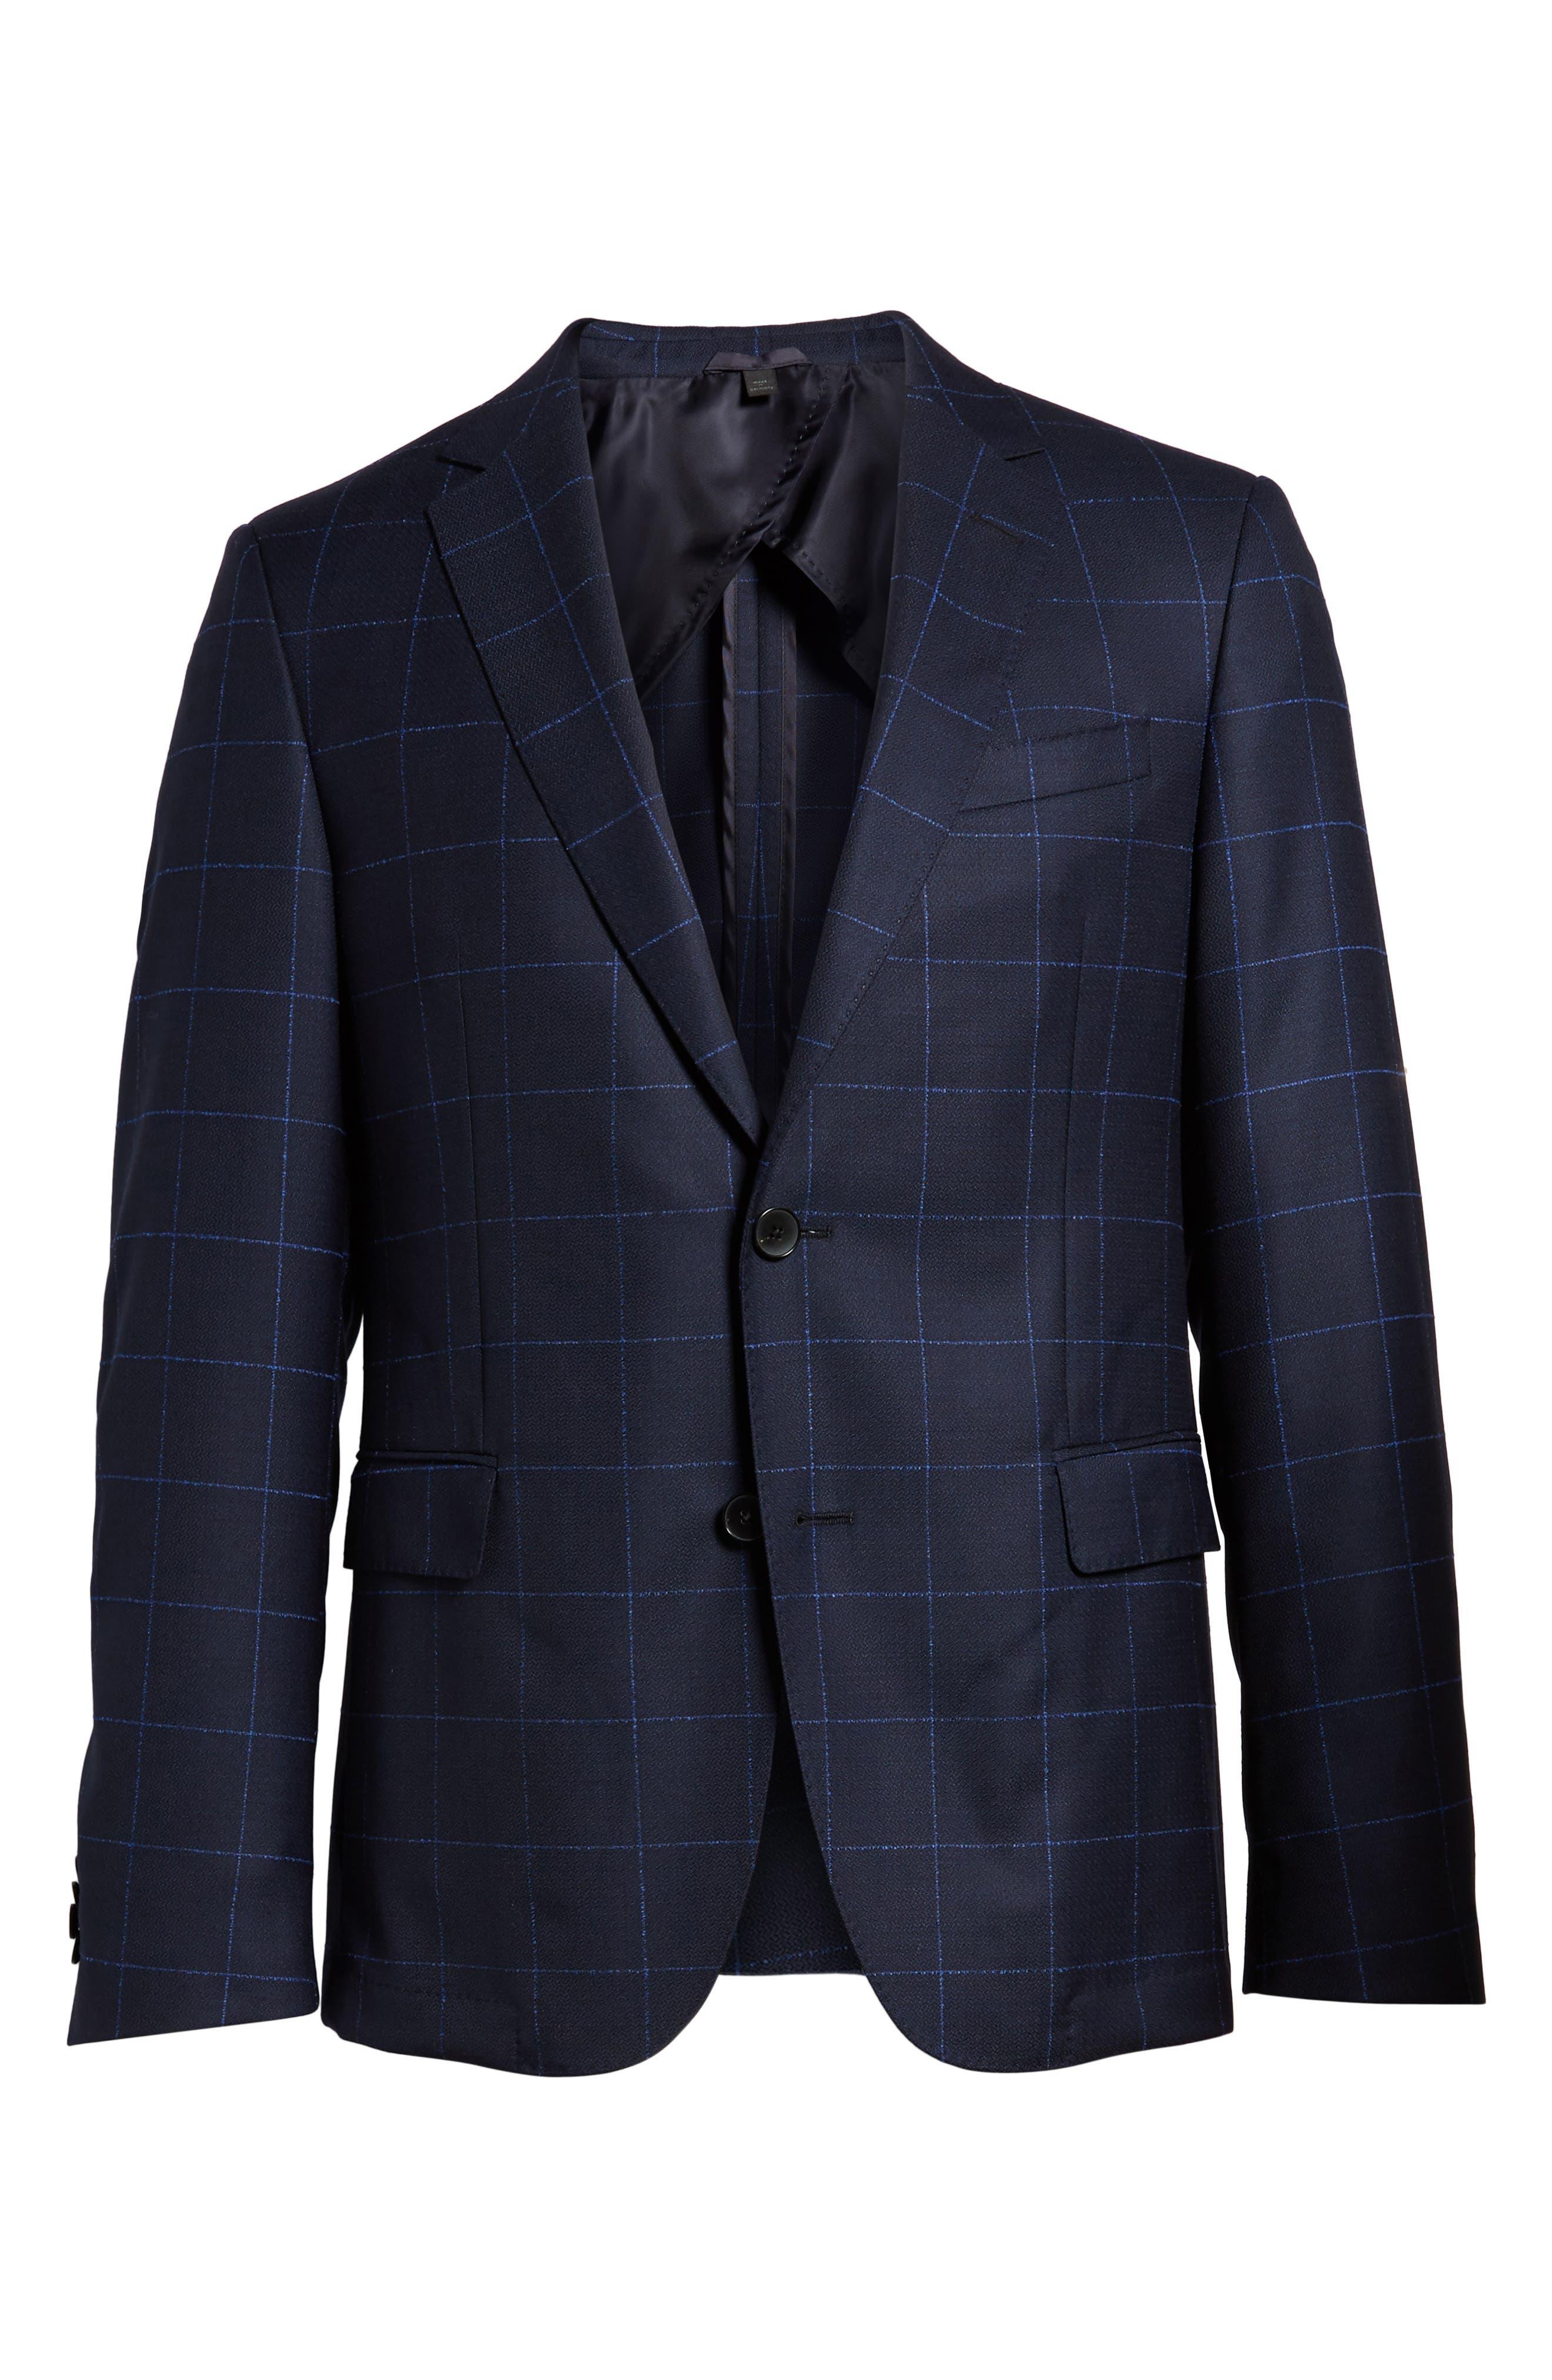 Nordstrom x BOSS Nobis Trim Fit Check Wool Sport Coat,                             Alternate thumbnail 5, color,